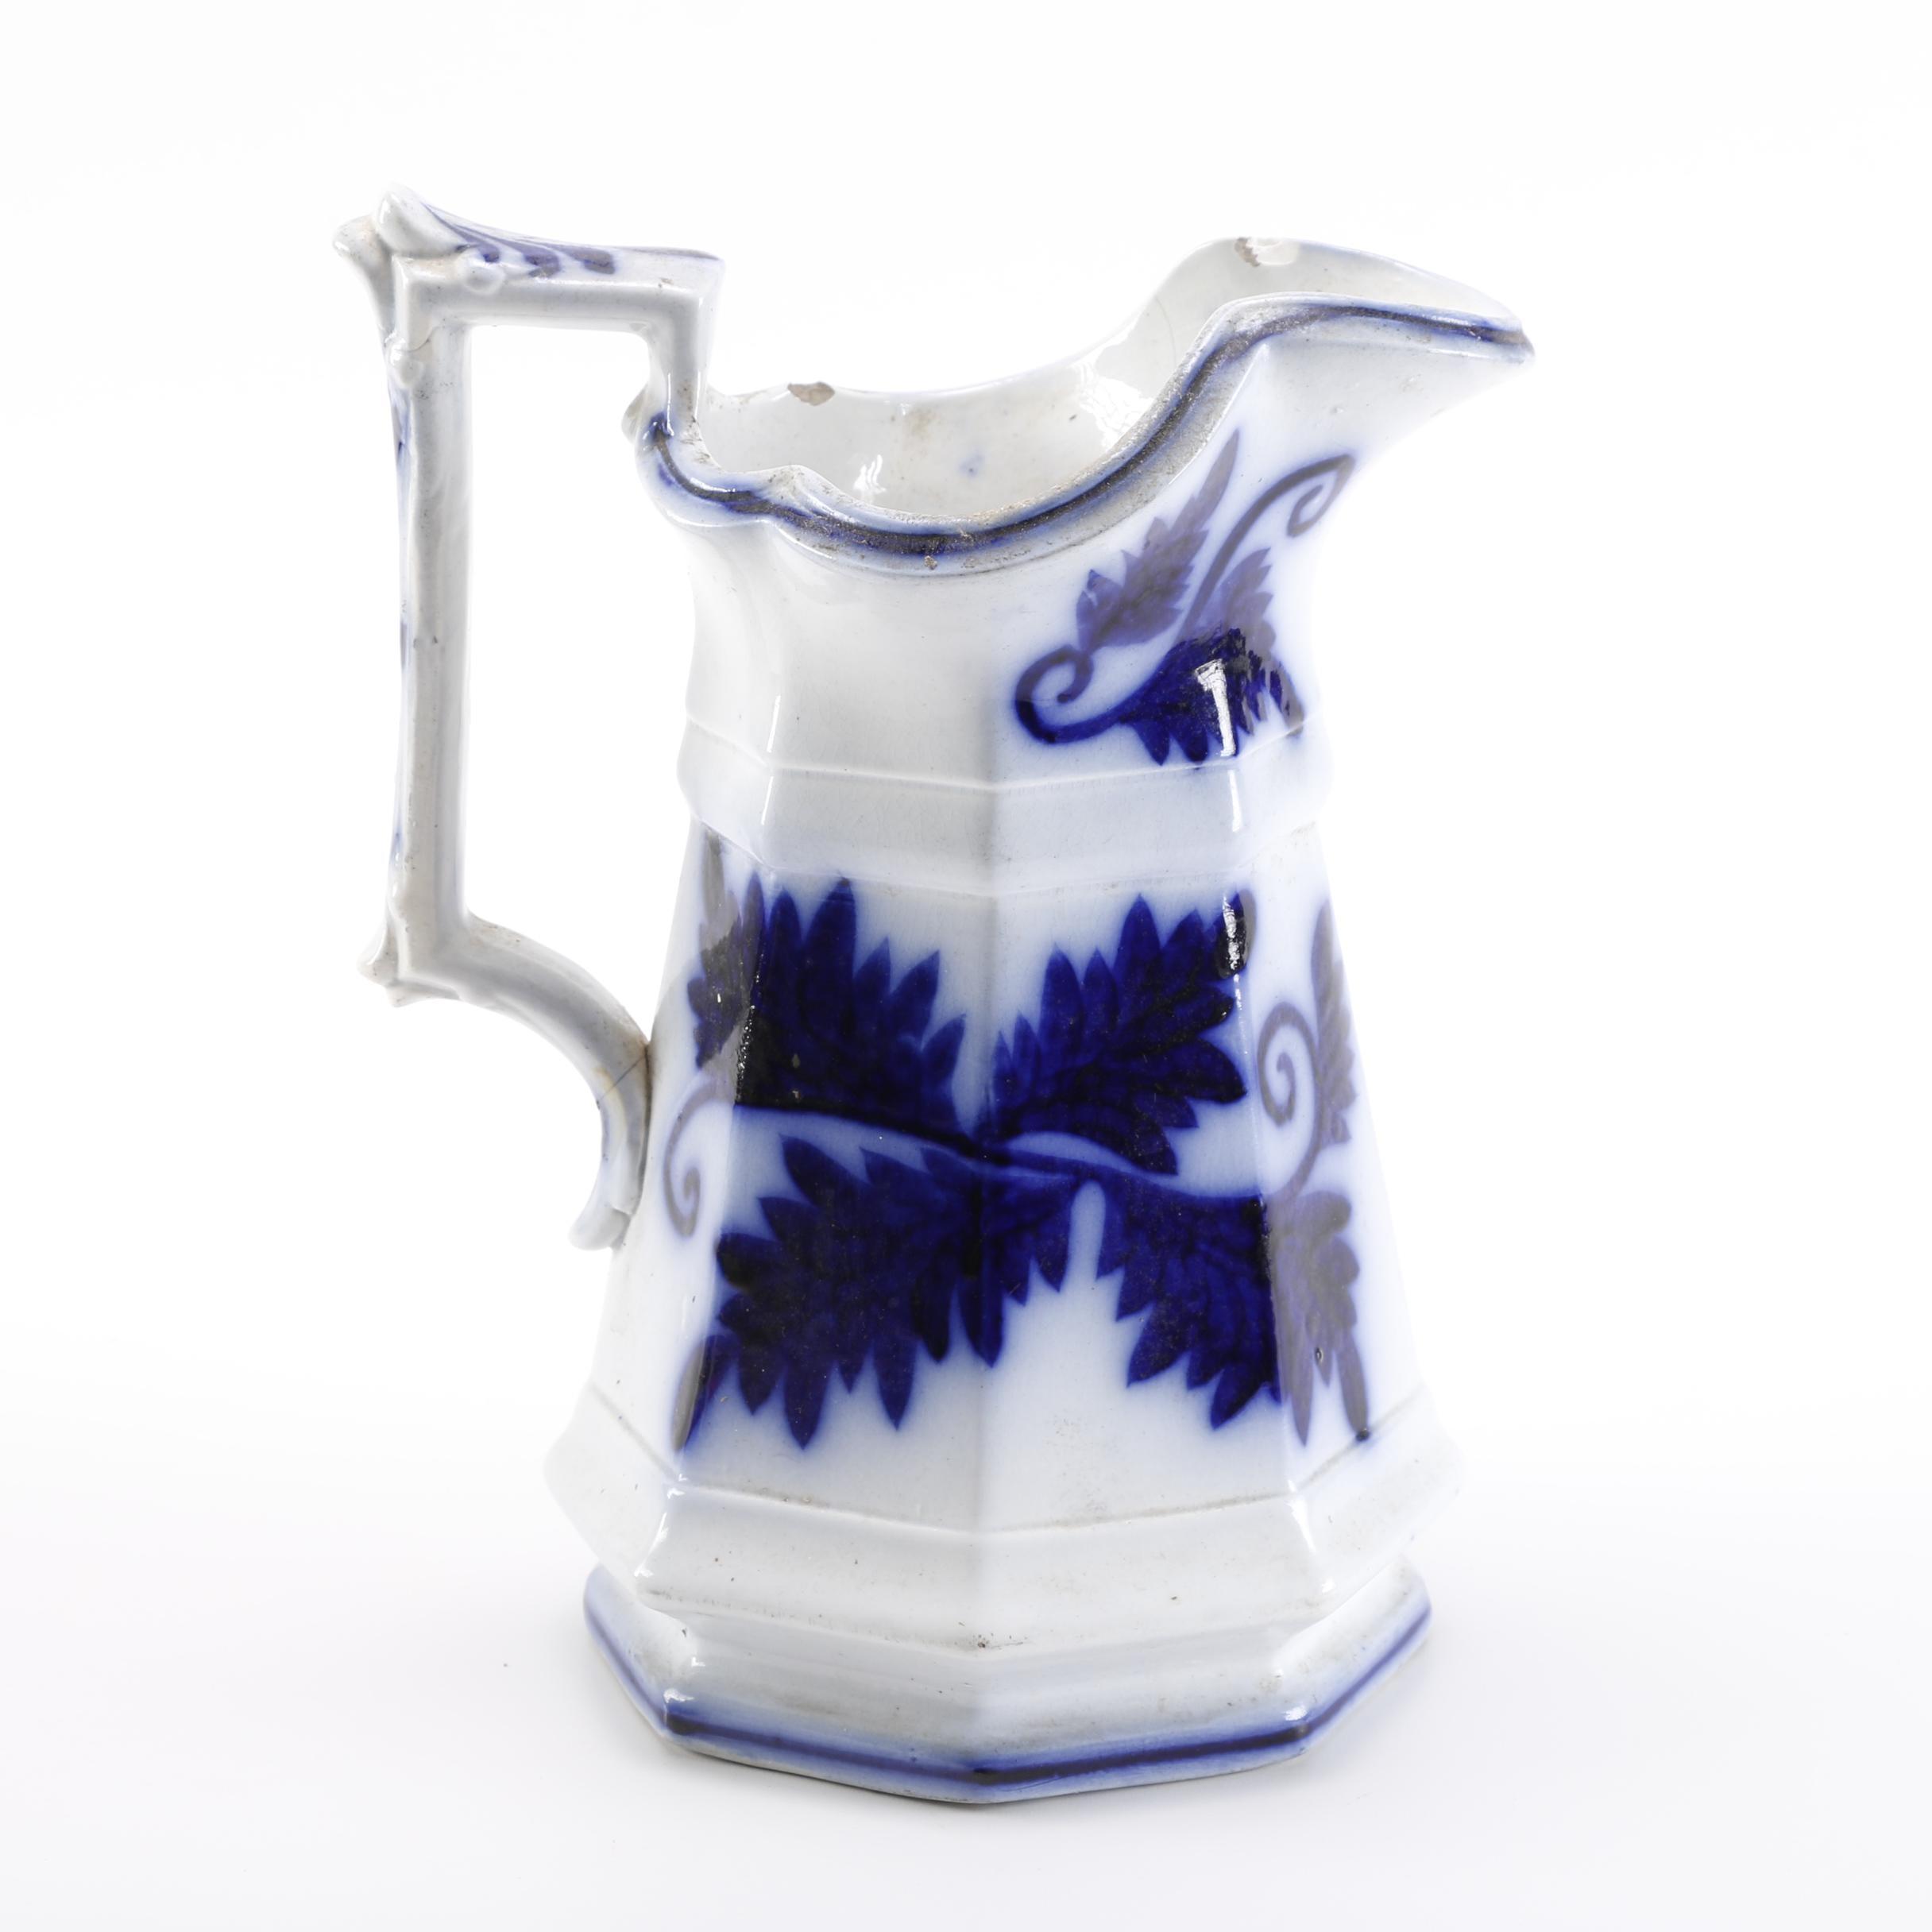 Flow Blue Style Ceramic Pitcher